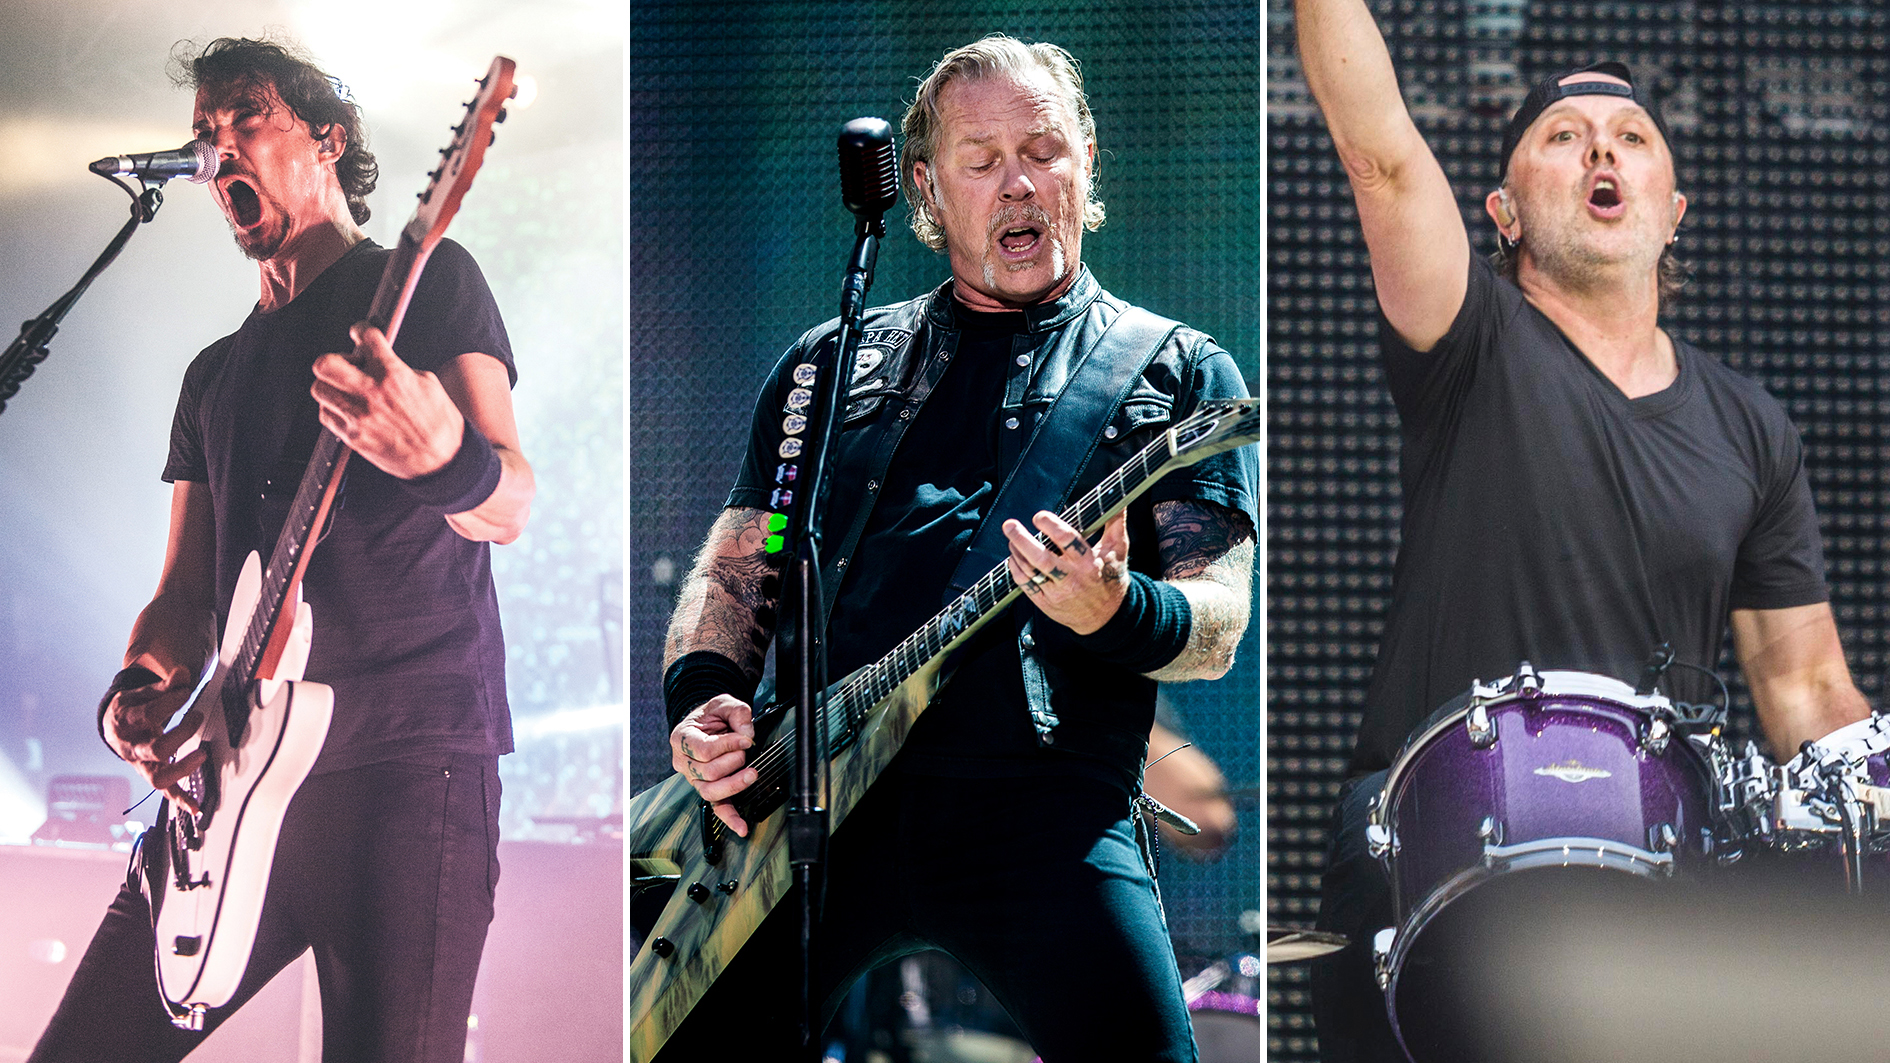 Gojira's Joe Duplantier: James Hetfield barely has drums in his in-ear monitors, Lars Ulrich follows his lead onstage